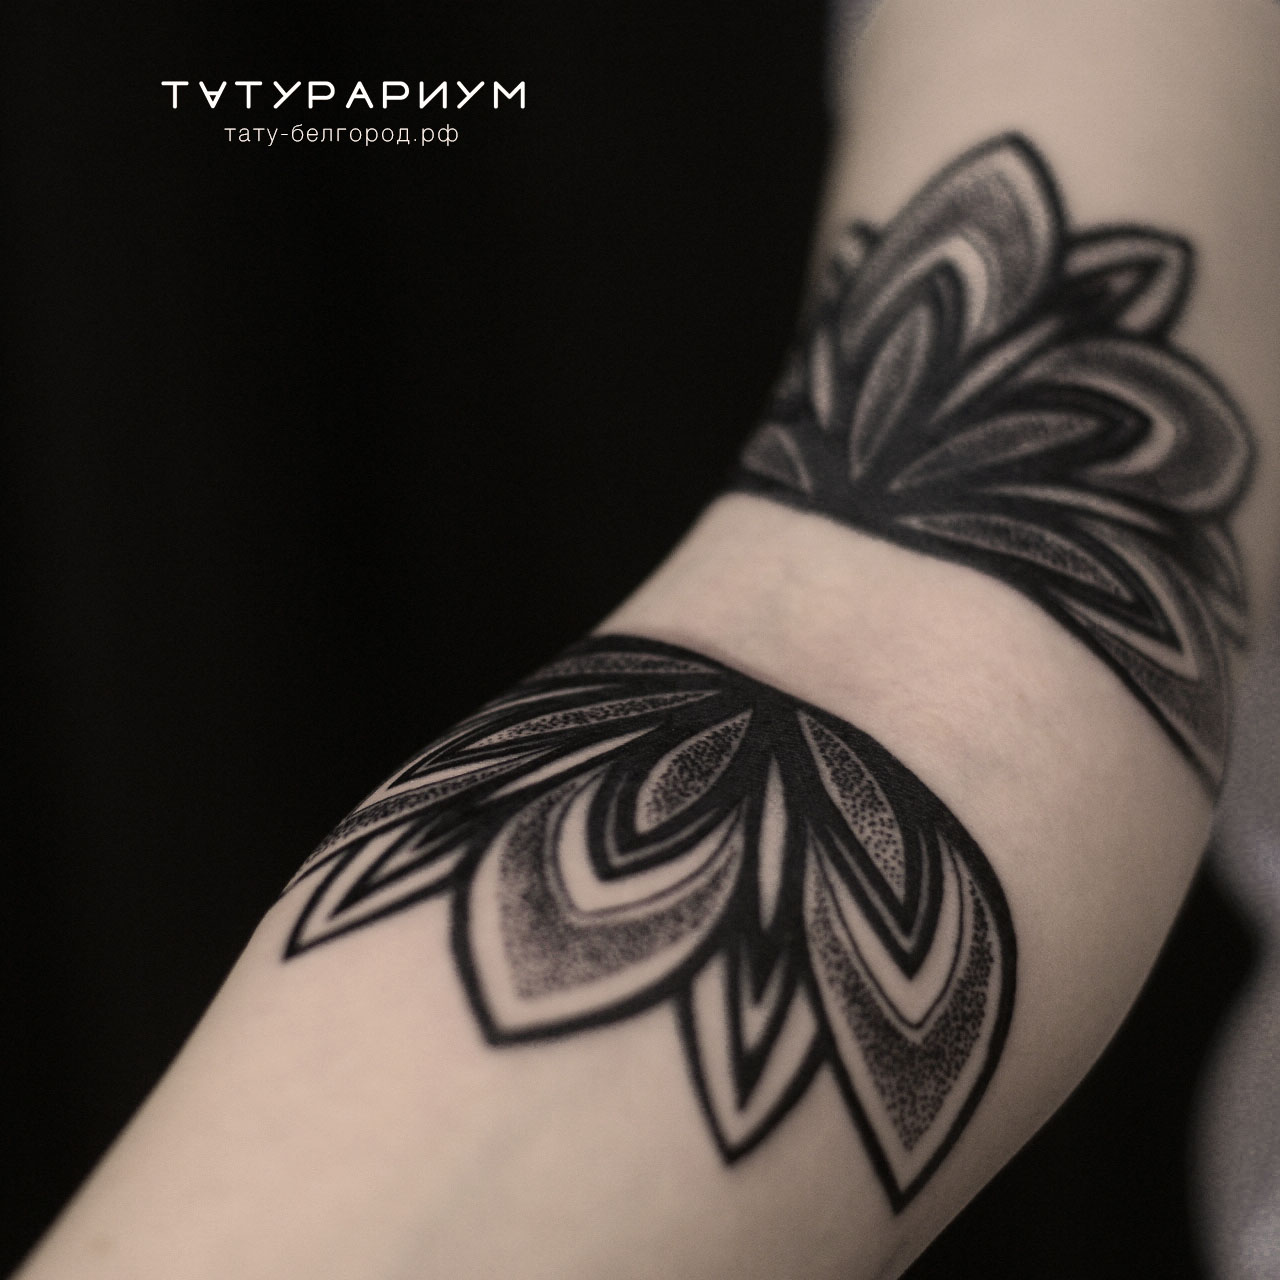 Фото татуировки, нандала на сгибе руки у